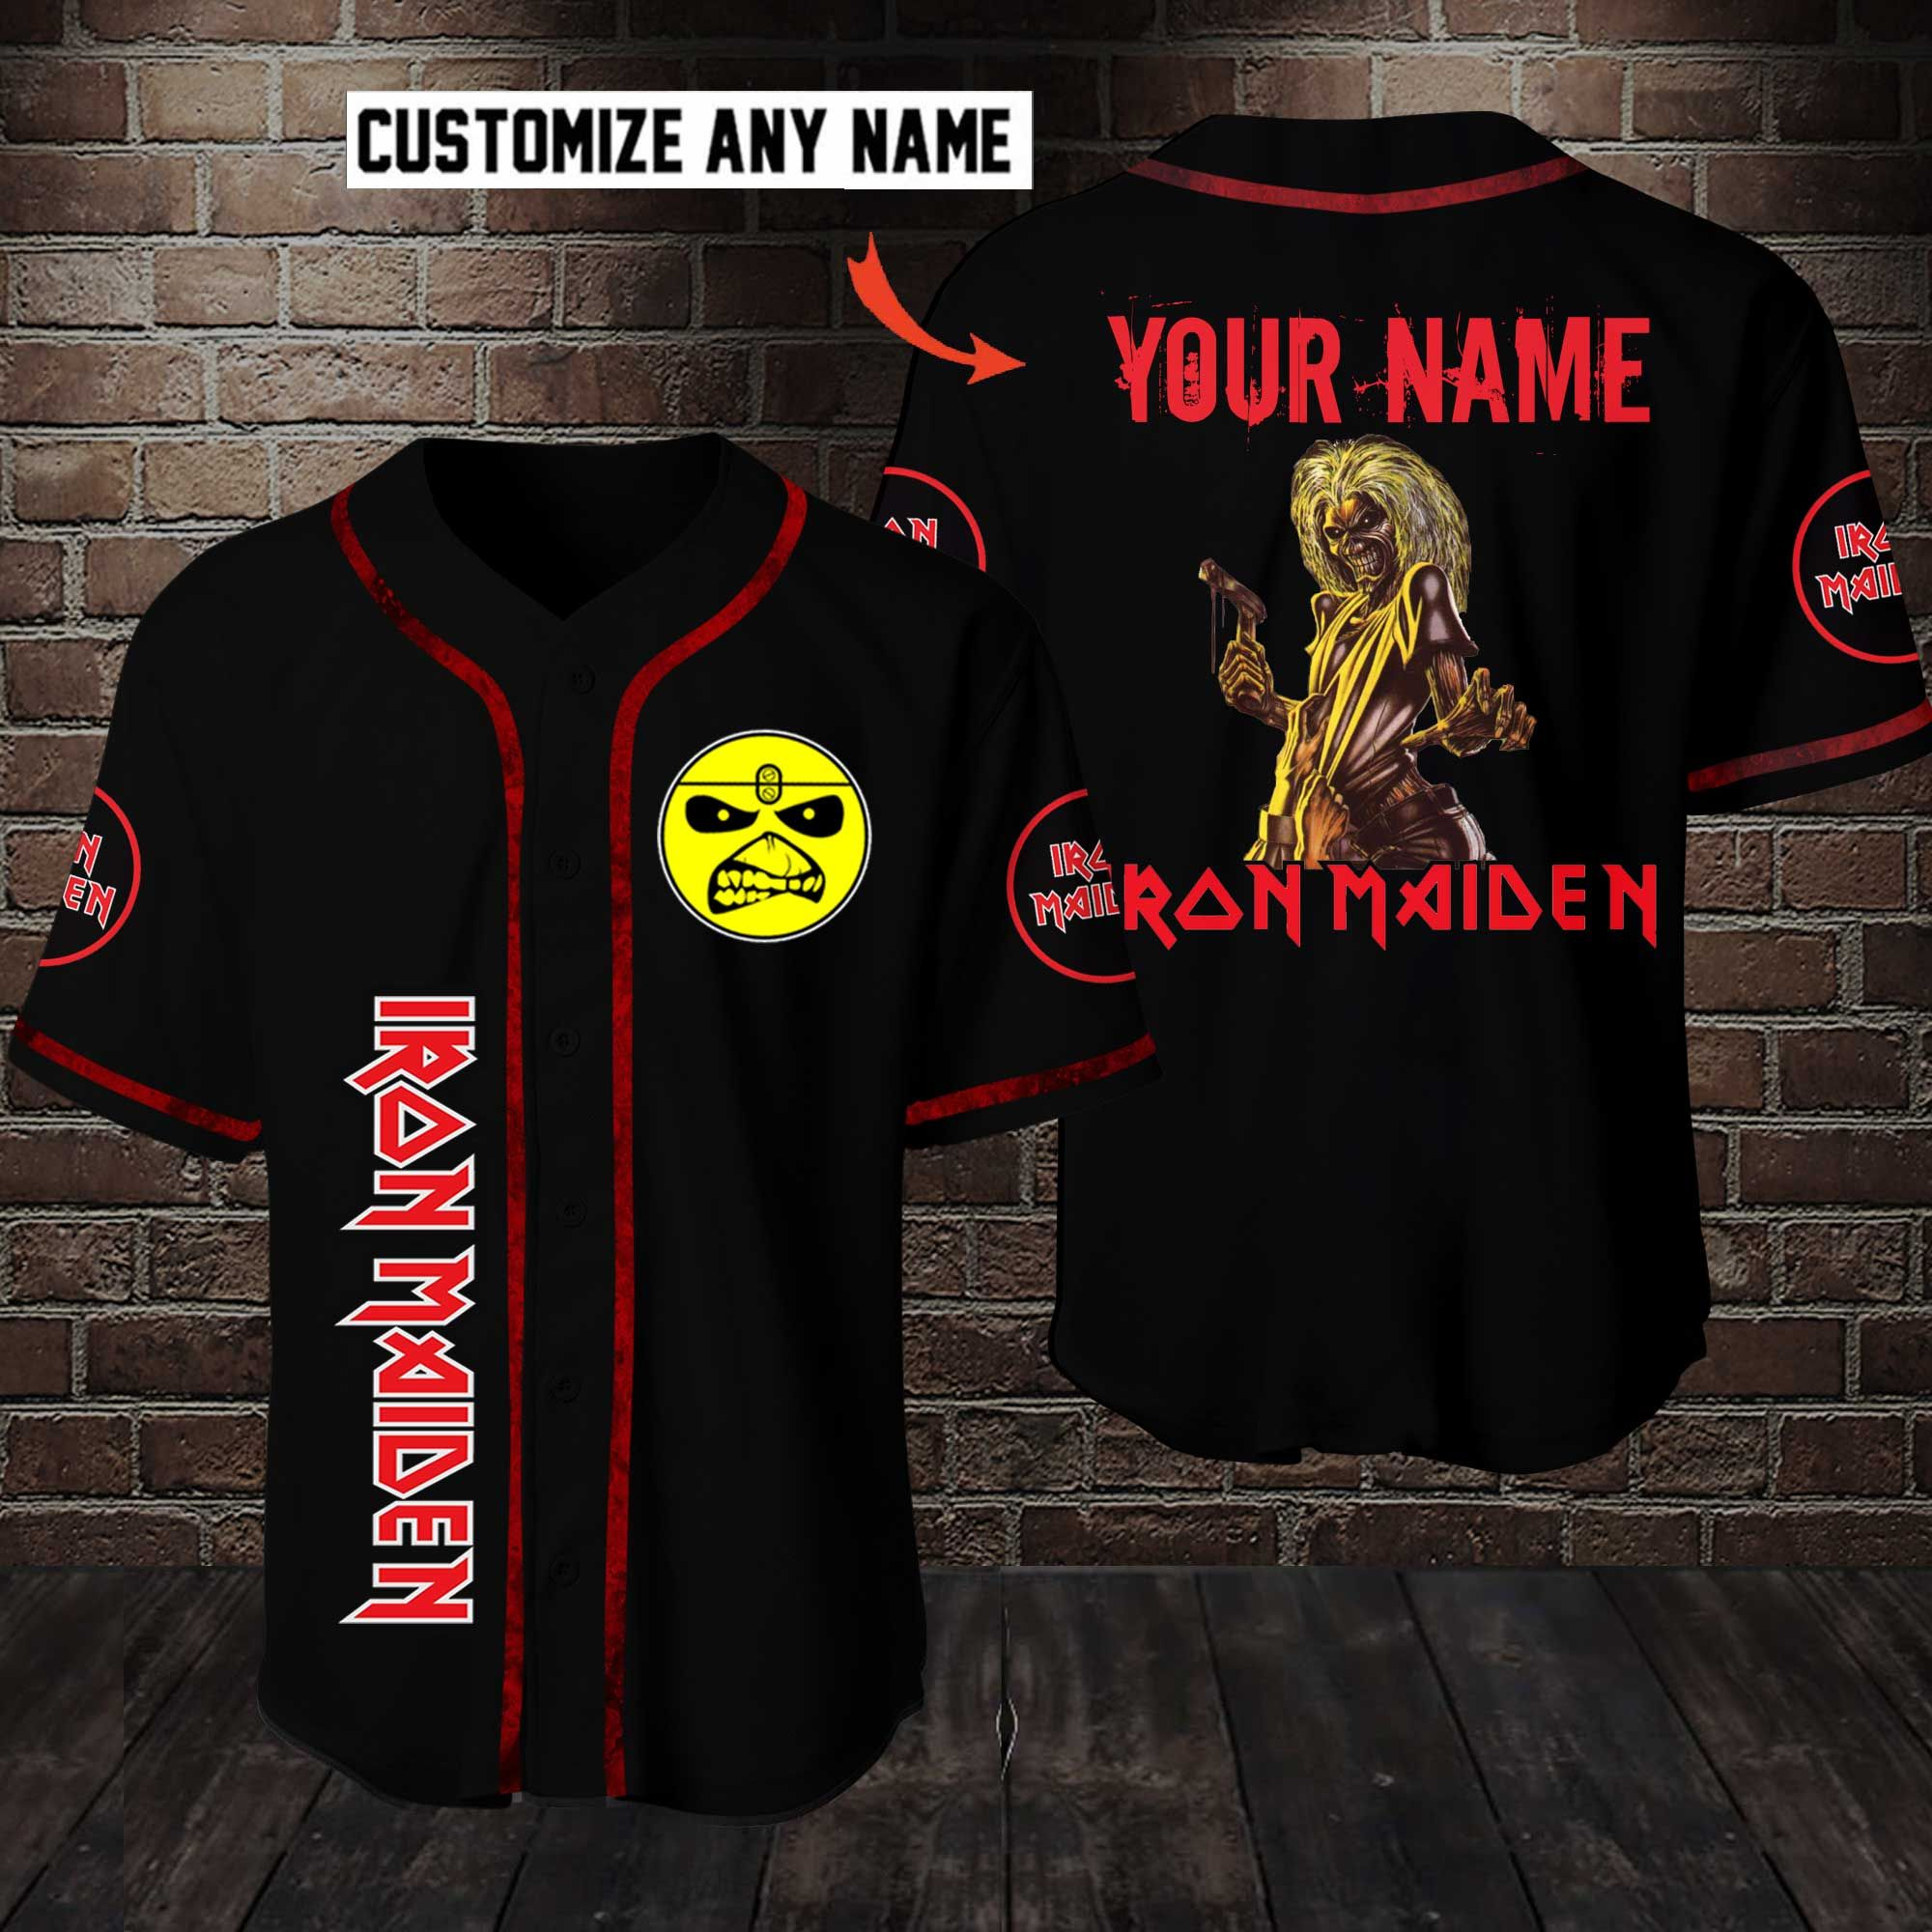 Iron Maiden Scary Customize Name Baseball Jersey Shirt